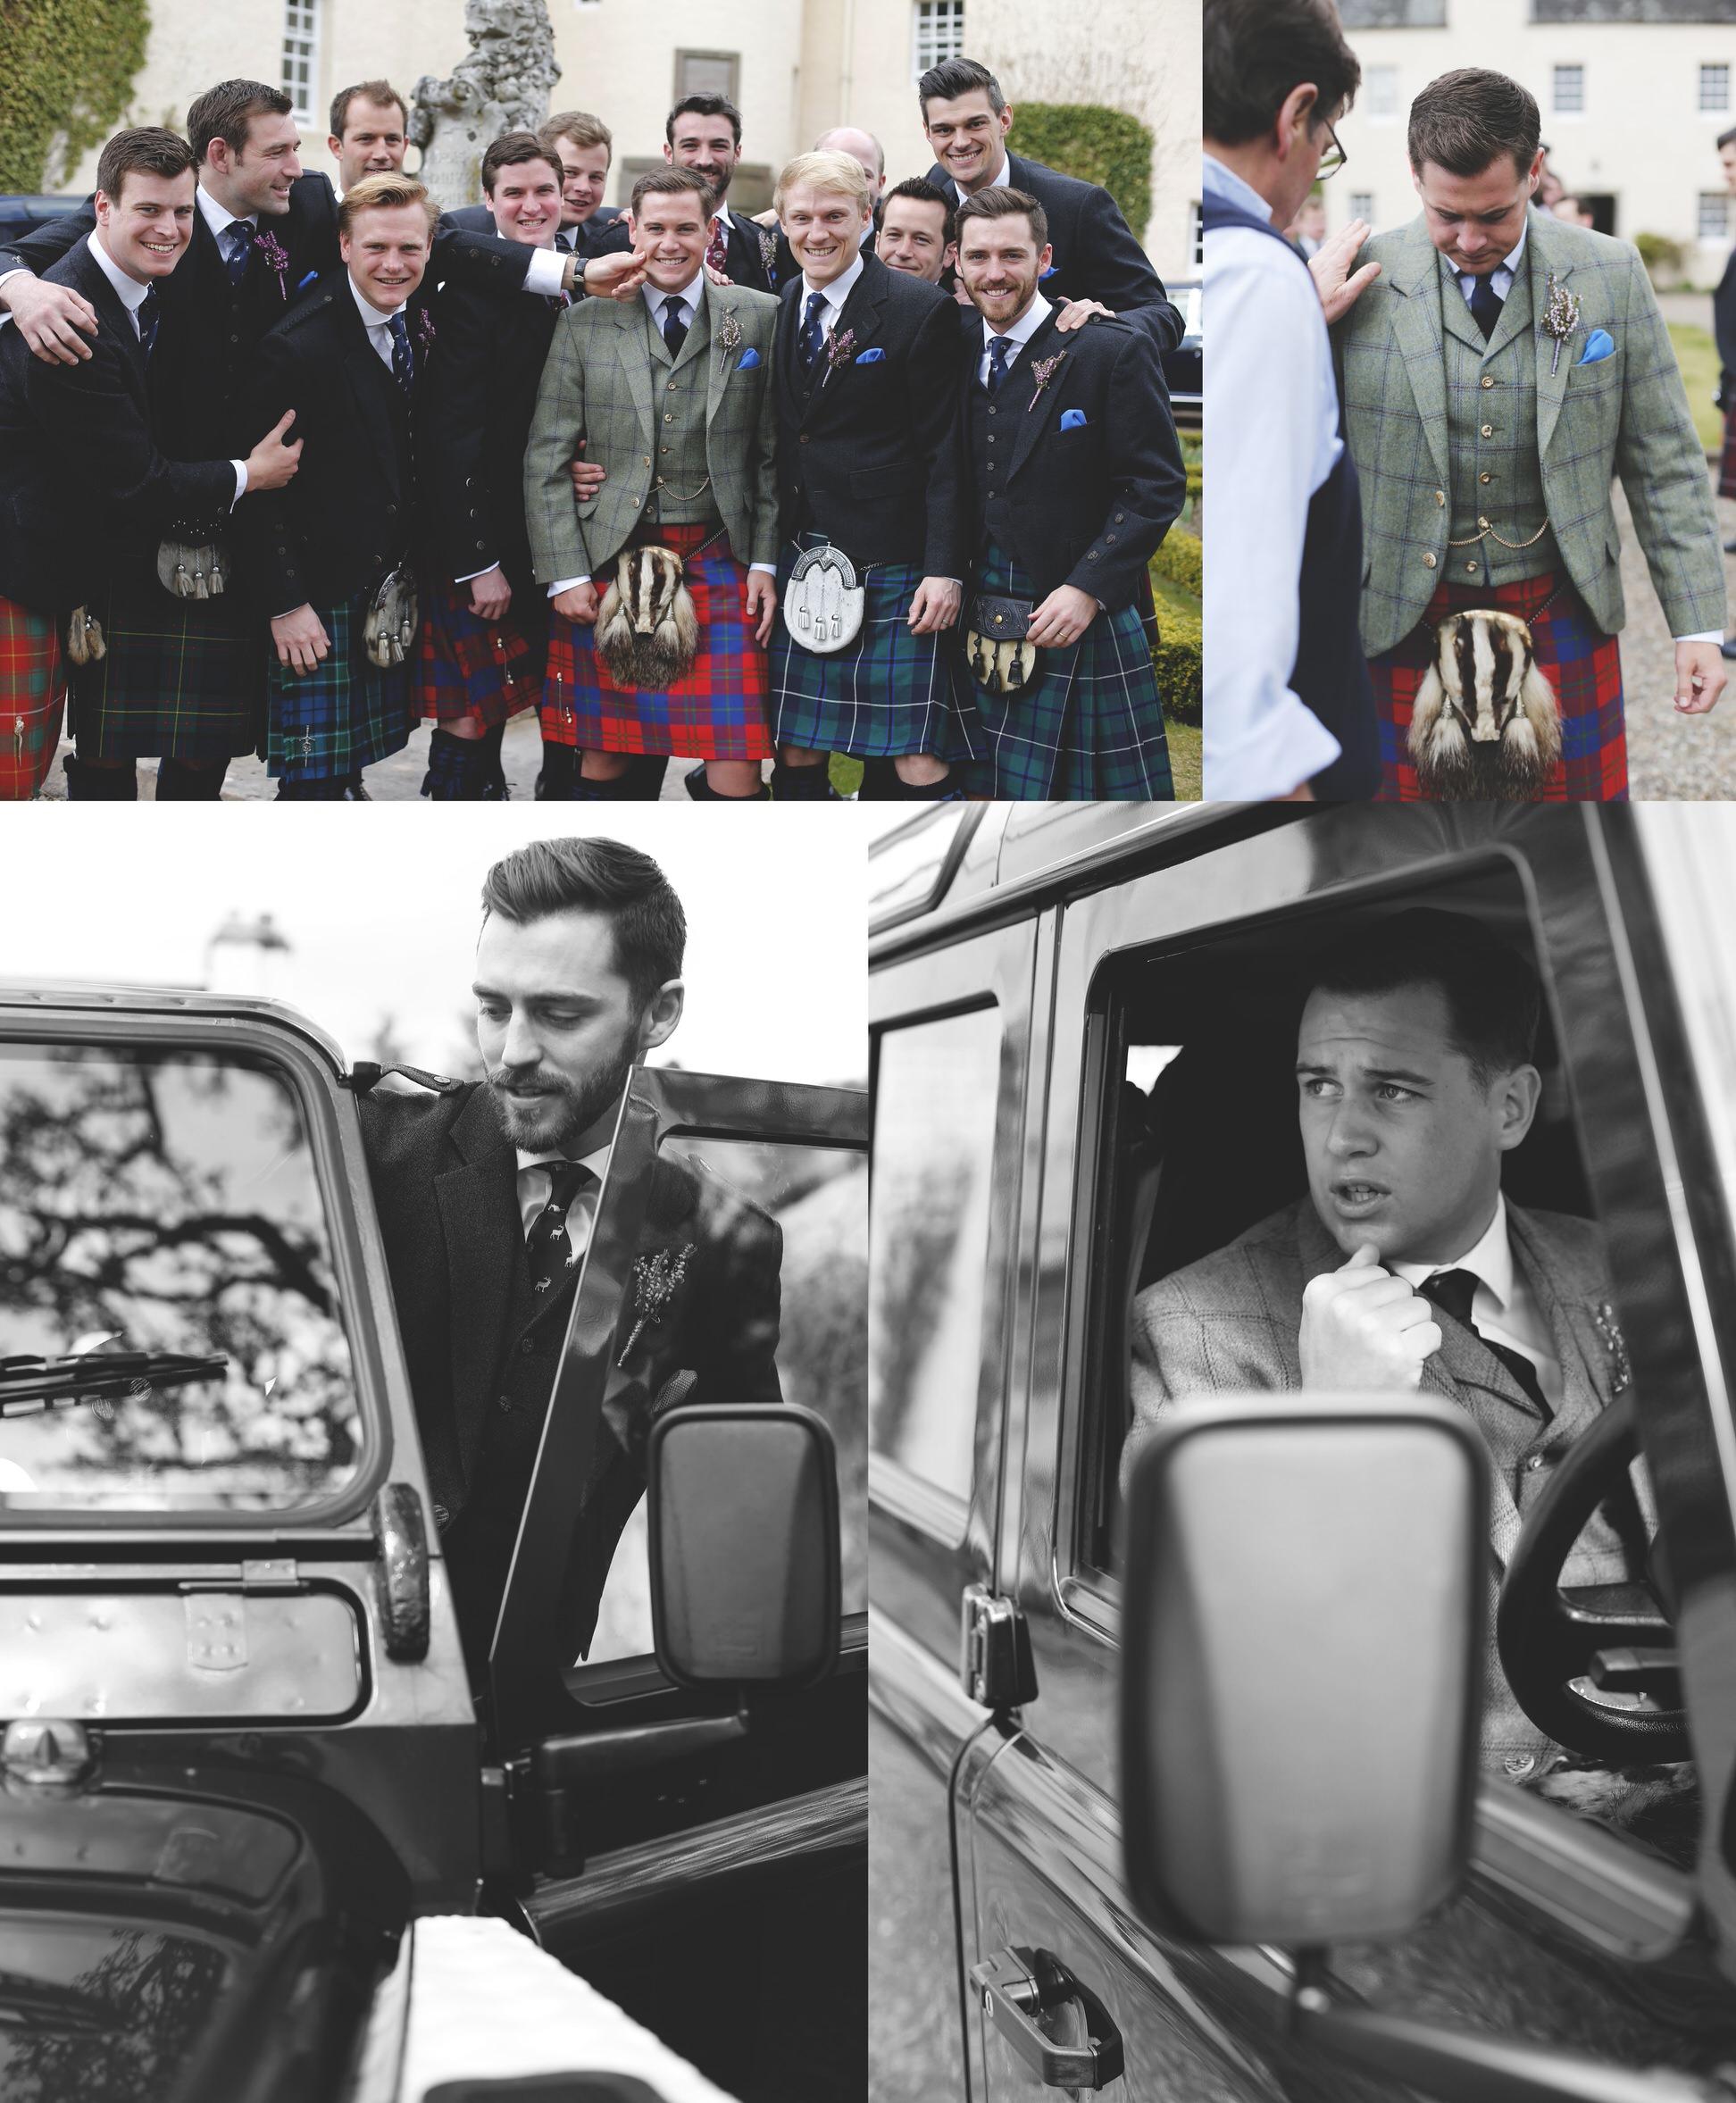 brett-harkness-cotland-wedding-photographer-highland-wedding_0005.jpg